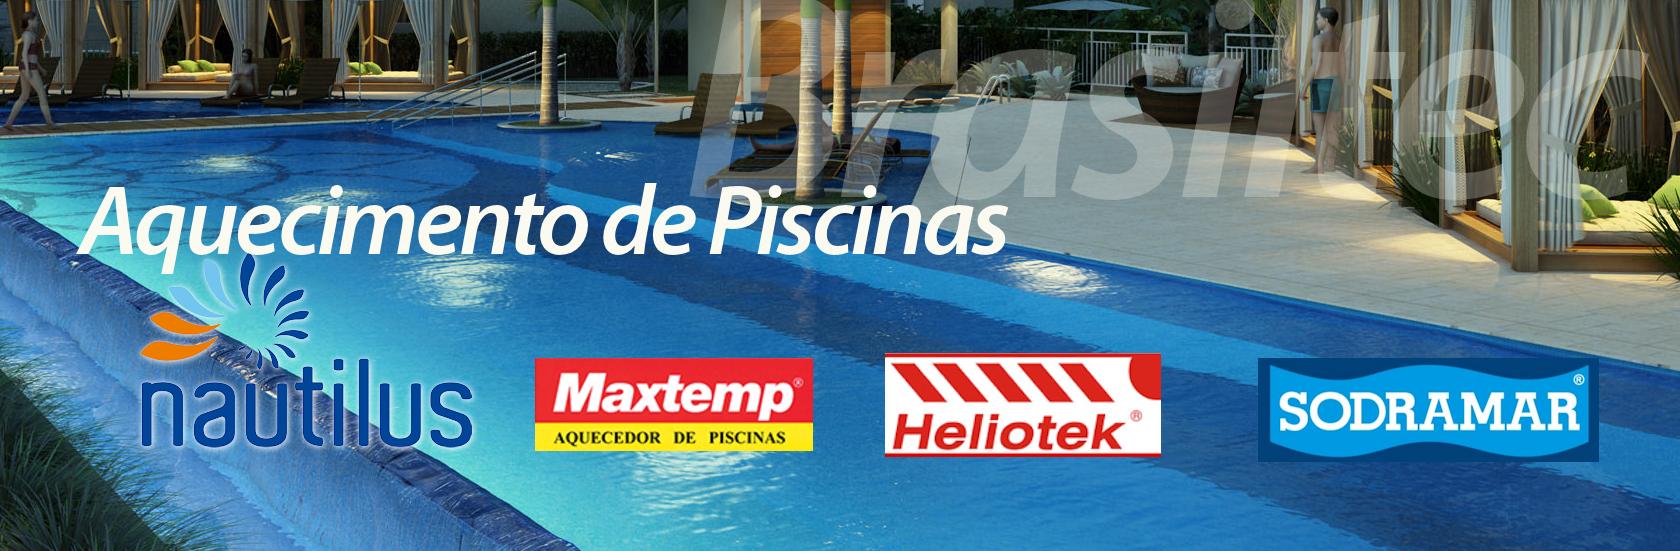 banner_piscinas